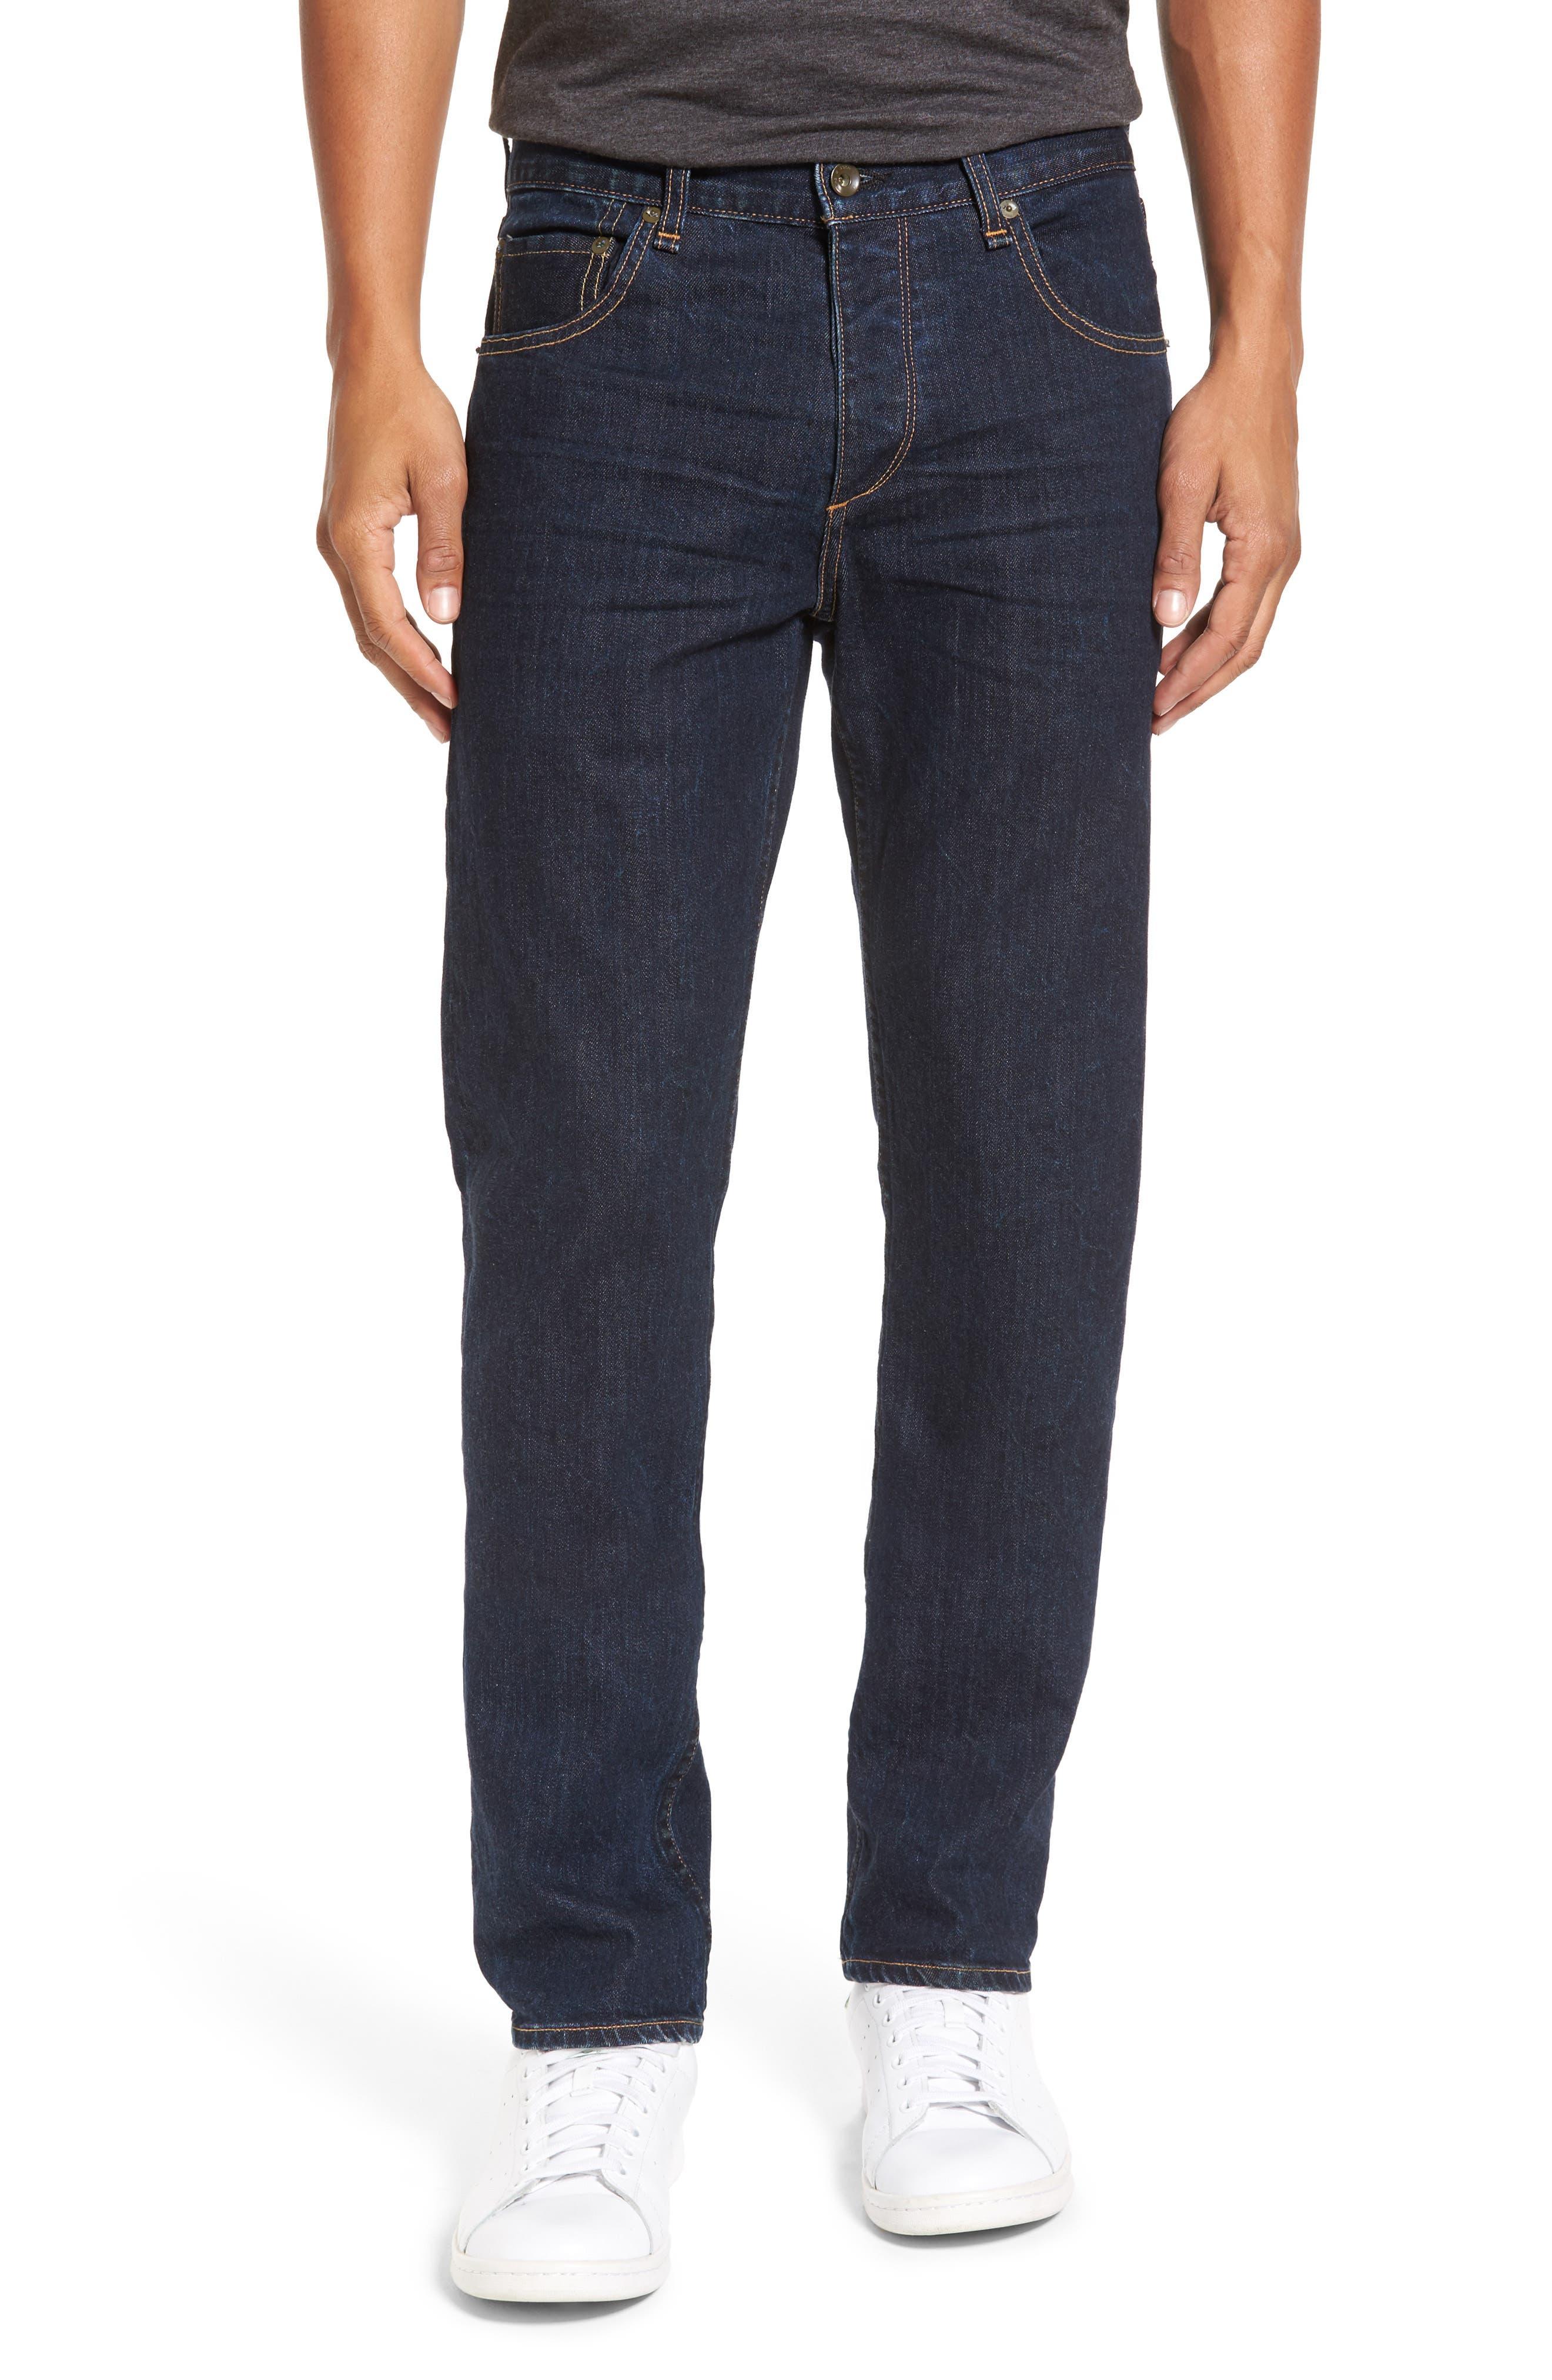 RAG & BONE Standard Issue Fit 3 Slim Straight Leg Jeans, Main, color, HERITAGE